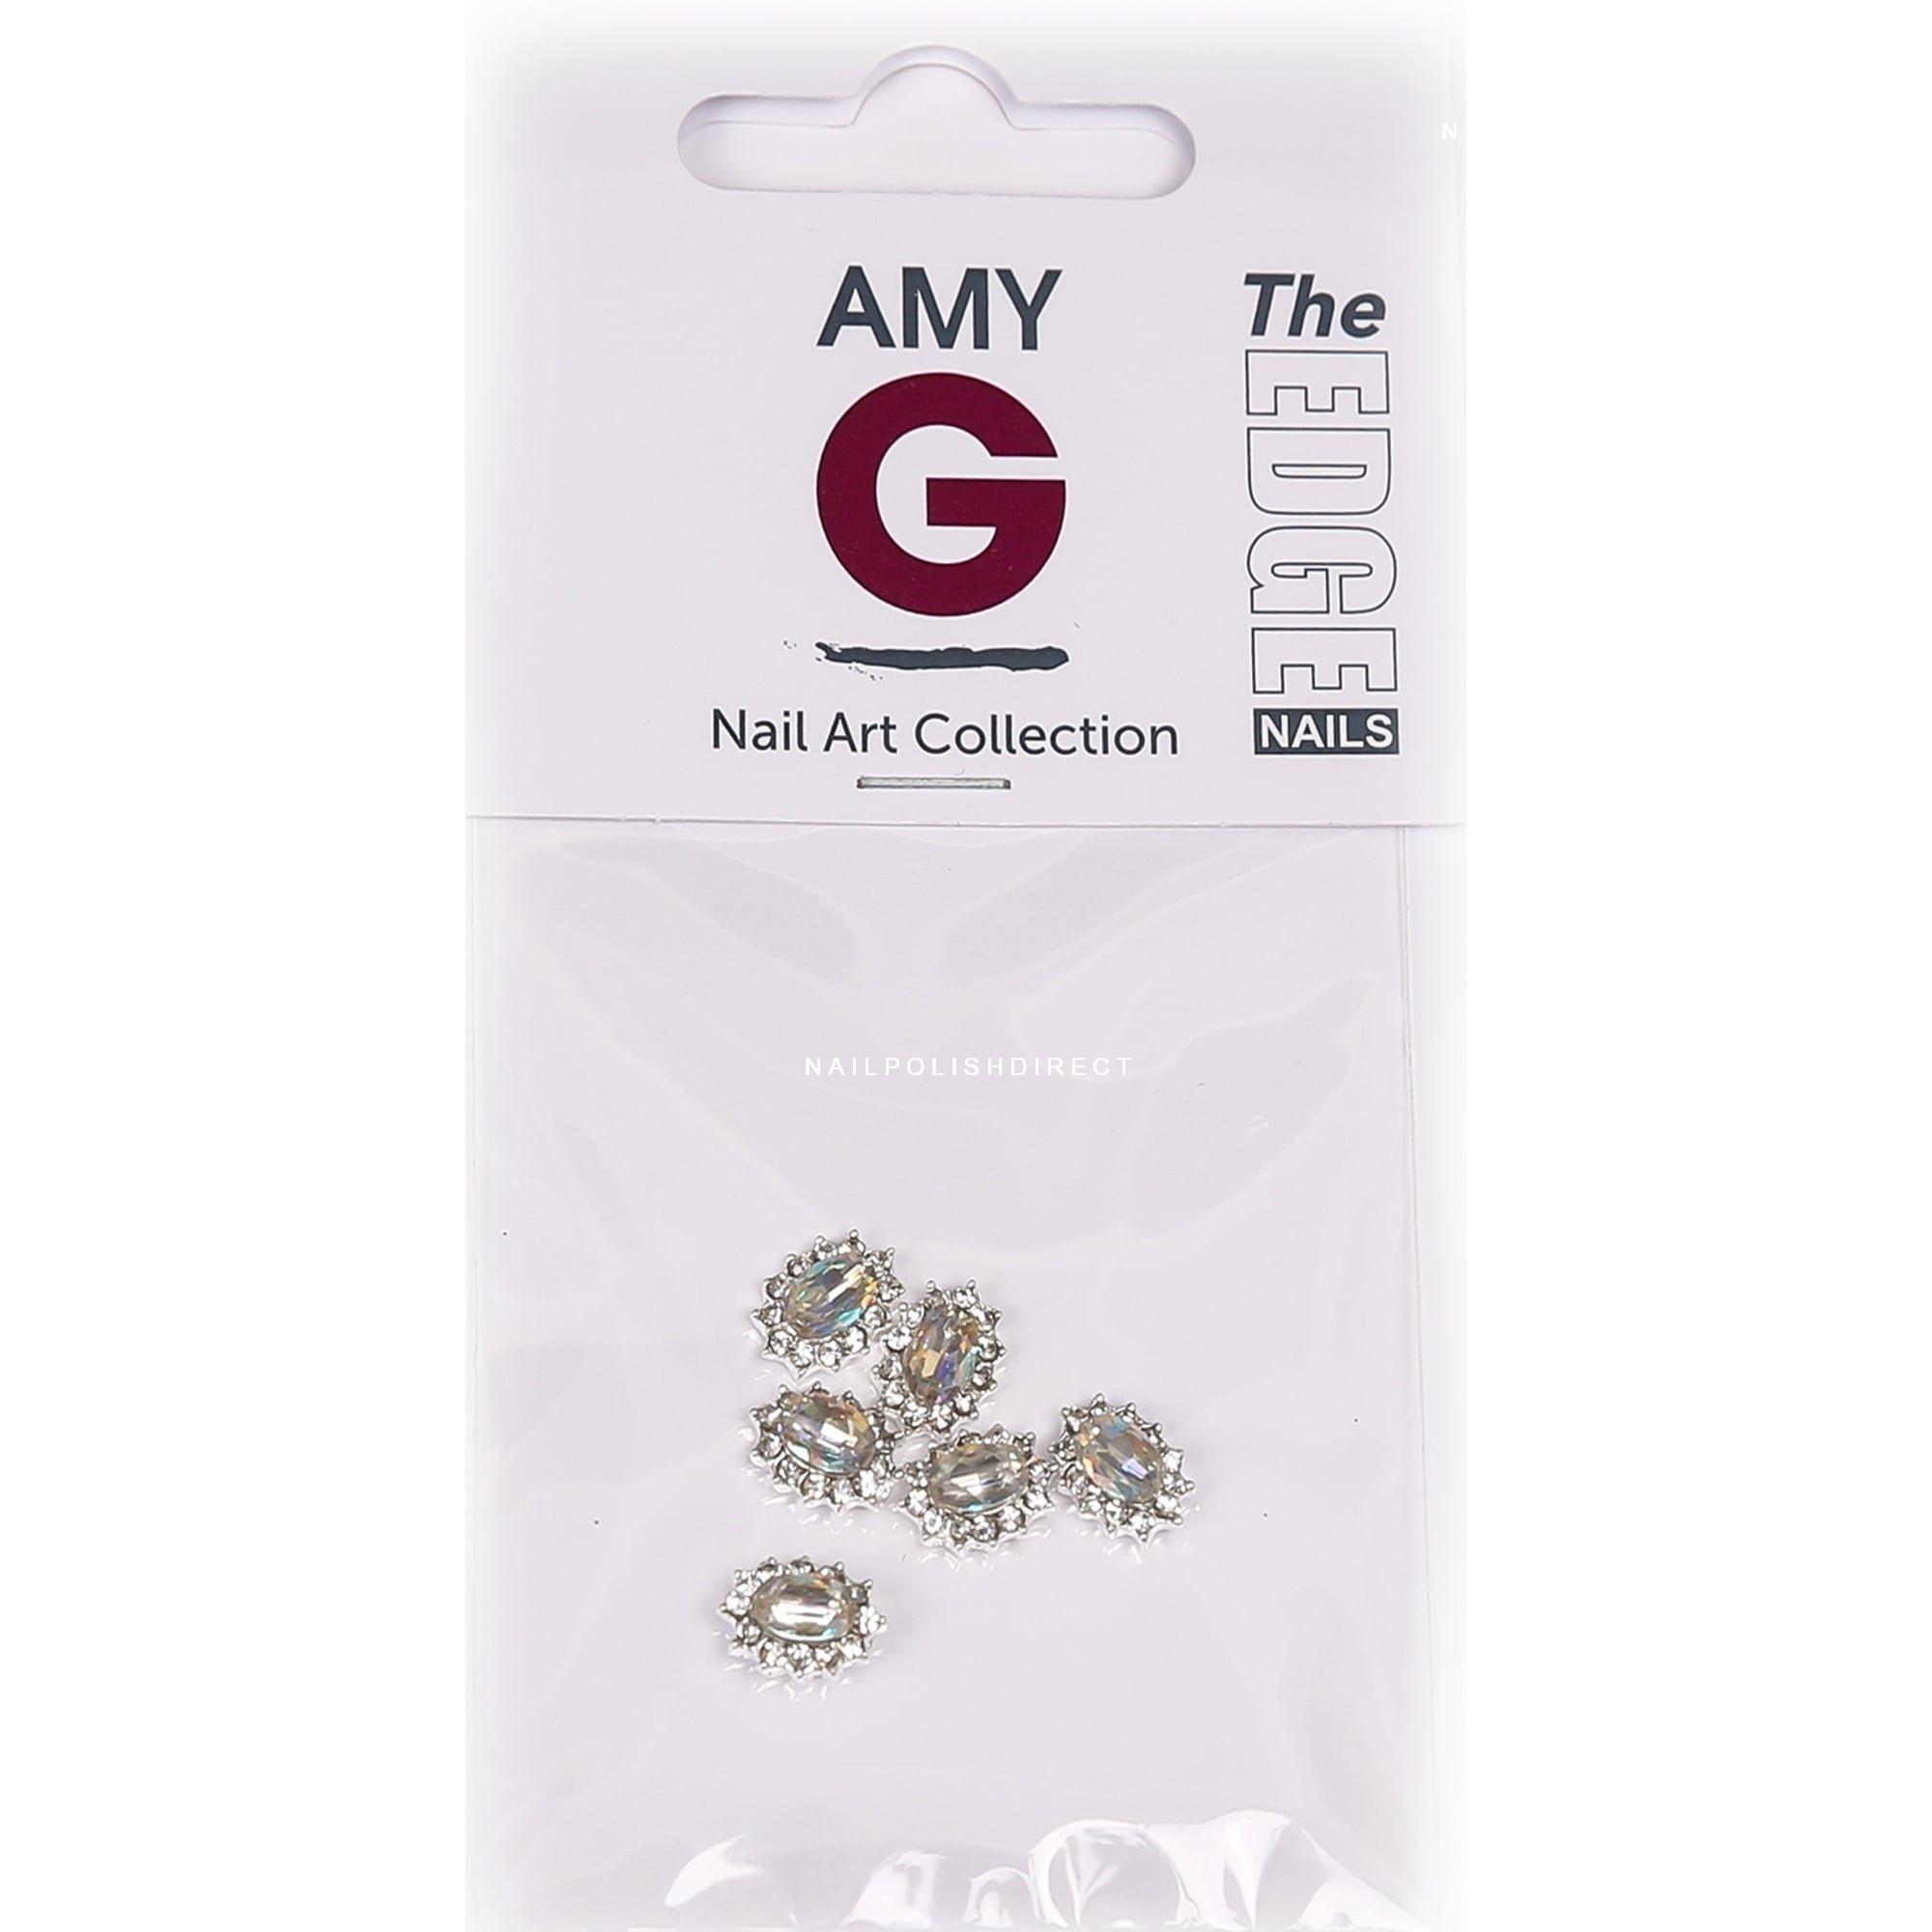 Amy G - 3D Nail Art Nail Jewels - Oval Diamond (6 PCS) (3003048)